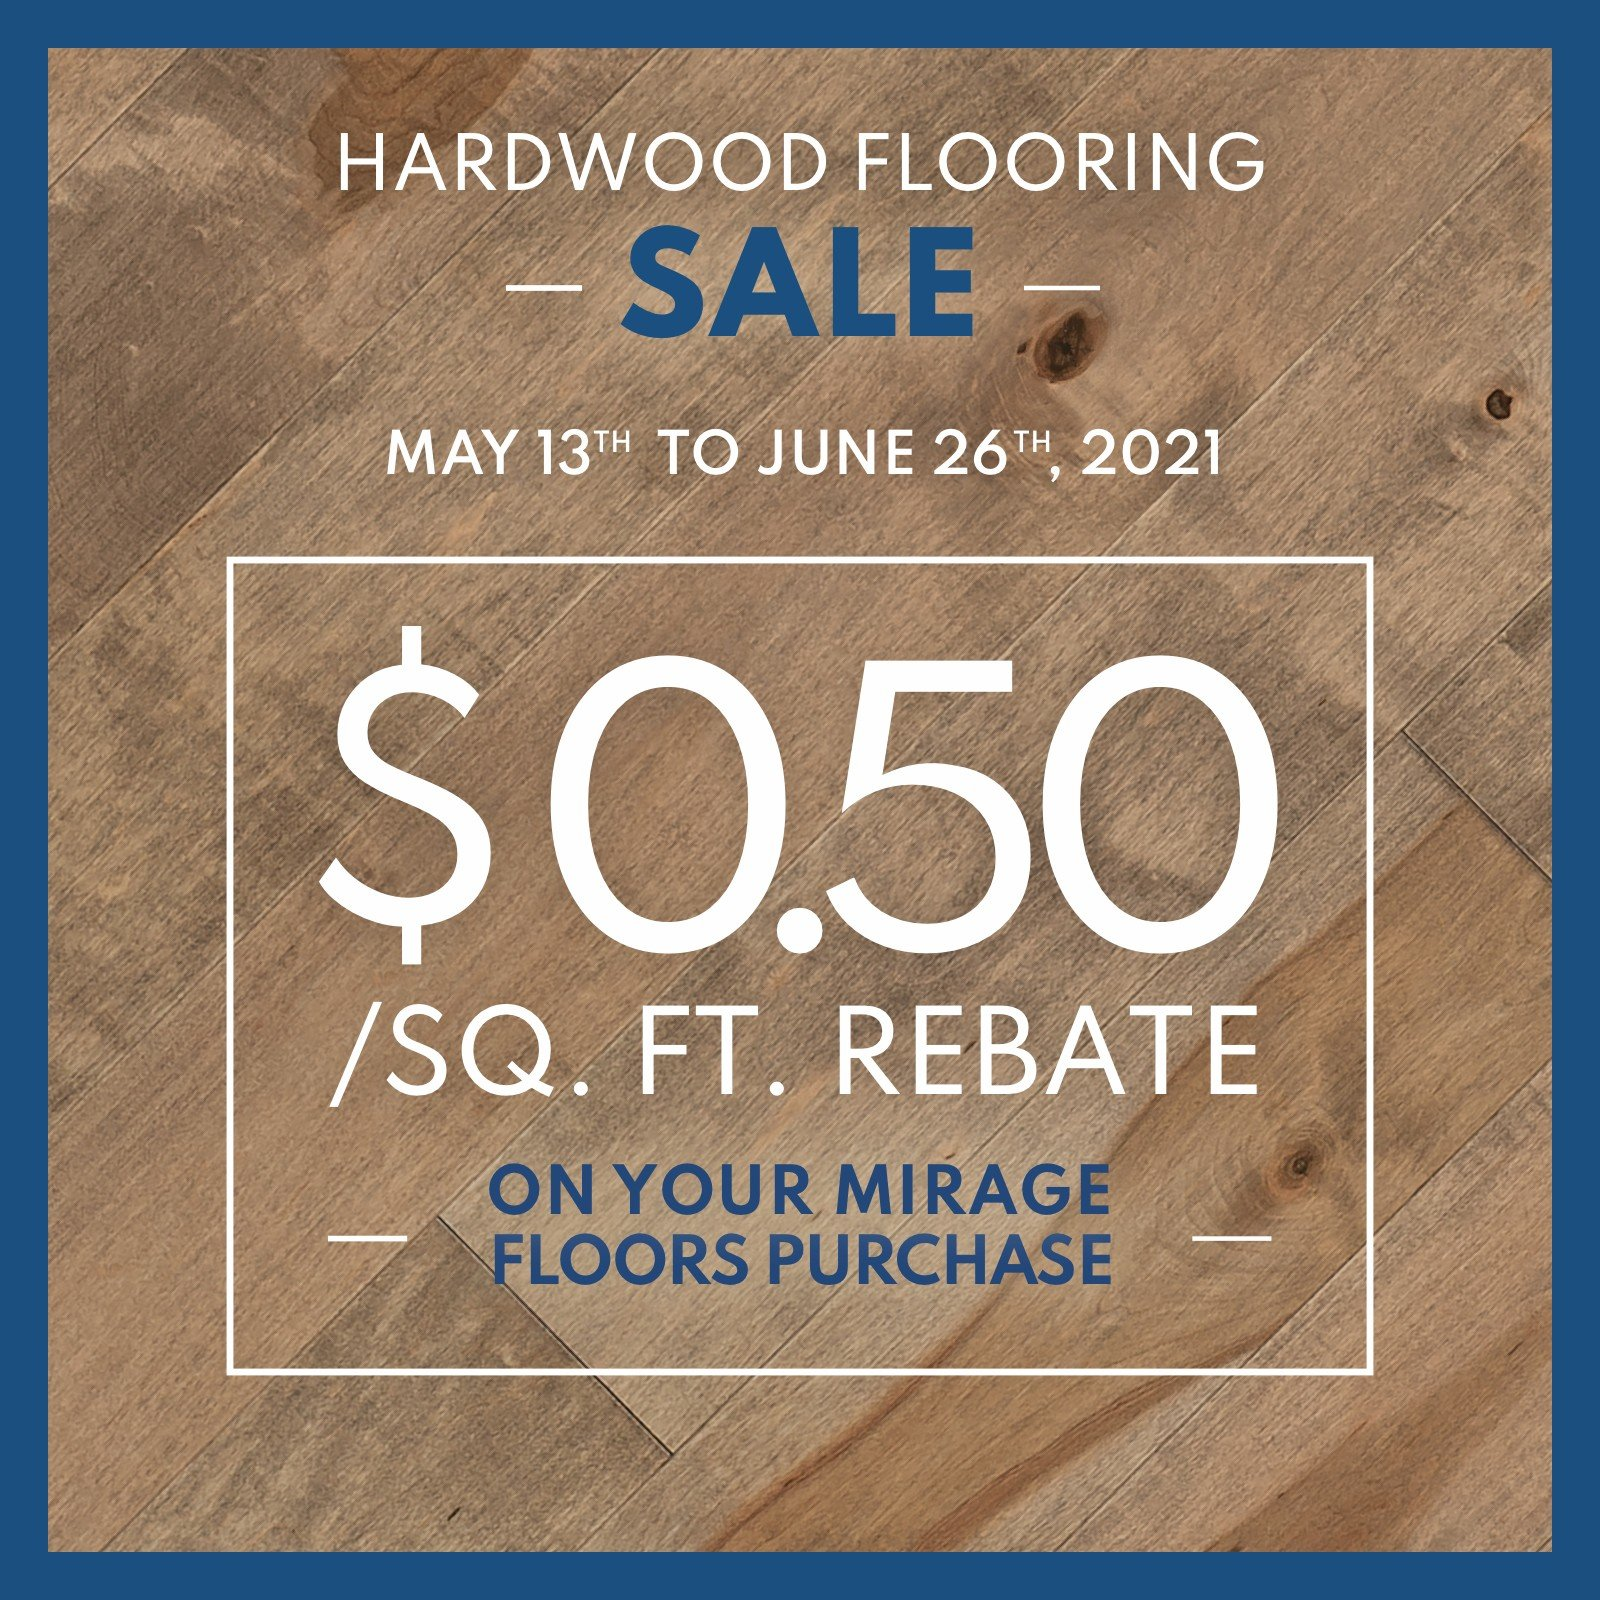 Mirage Hardwood Flooring Sale